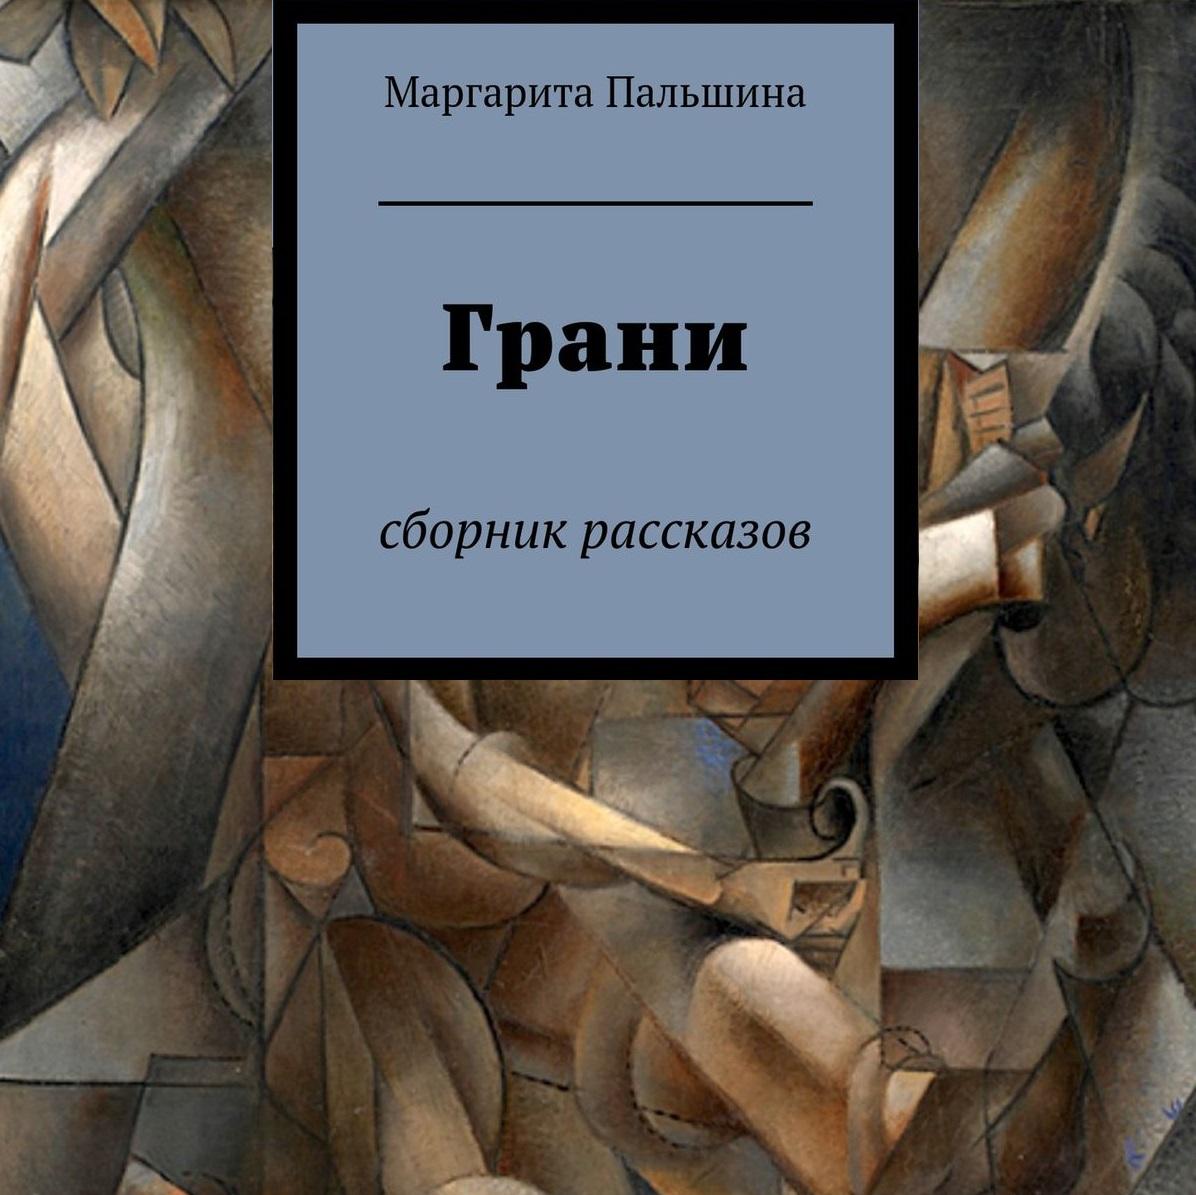 Маргарита Пальшина Грани loboda